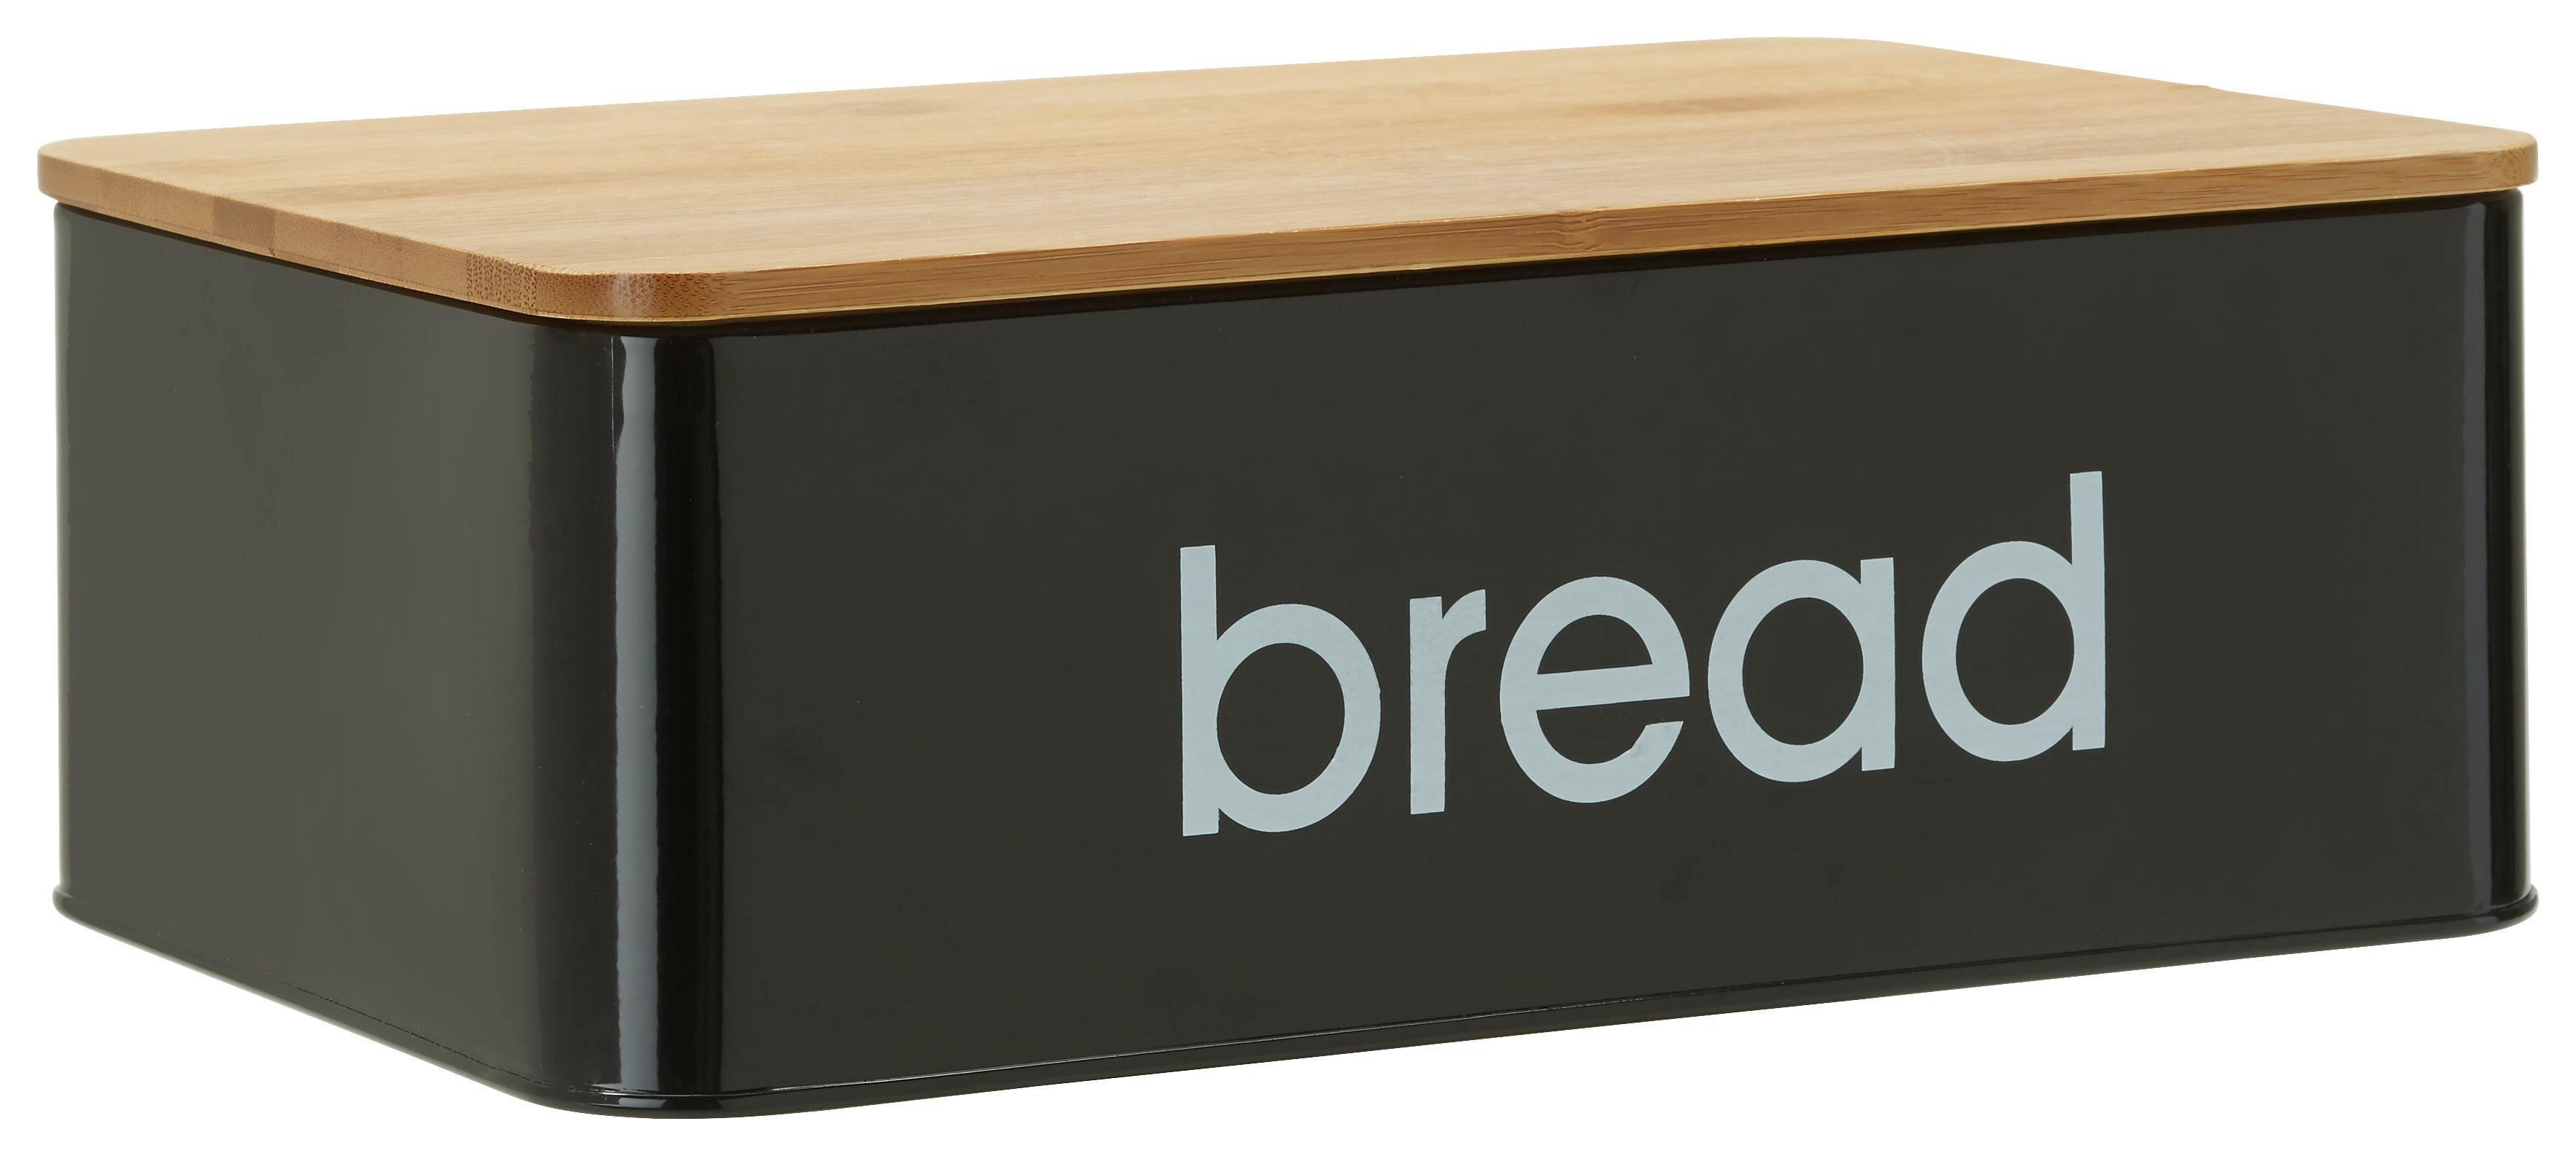 Brotbox Norman in Schwarz - Schwarz, LIFESTYLE, Holz/Metall (33/21/10,5cm) - MÖMAX modern living